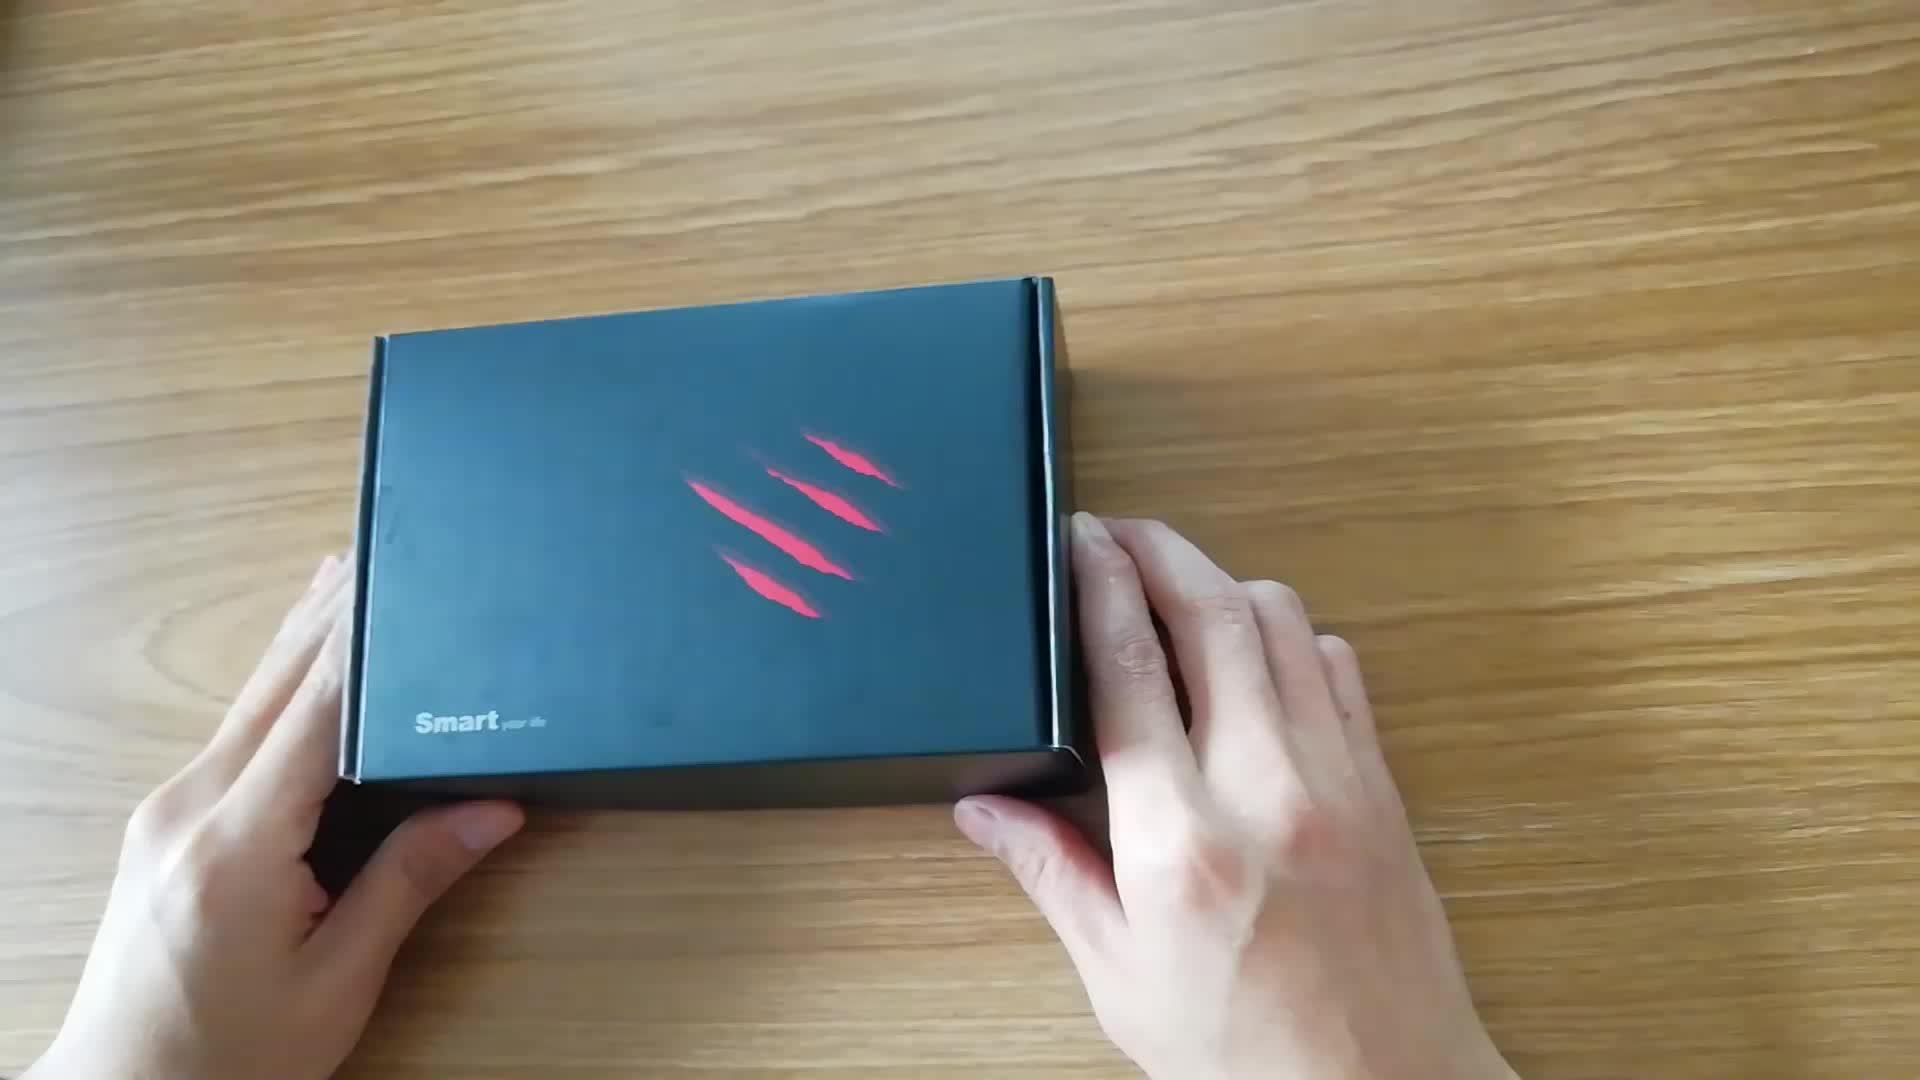 Hot selling android tv box TX3 mini 2gb 16gb S905W quad core android 8.1 smart TV box better than X96 mini set top box